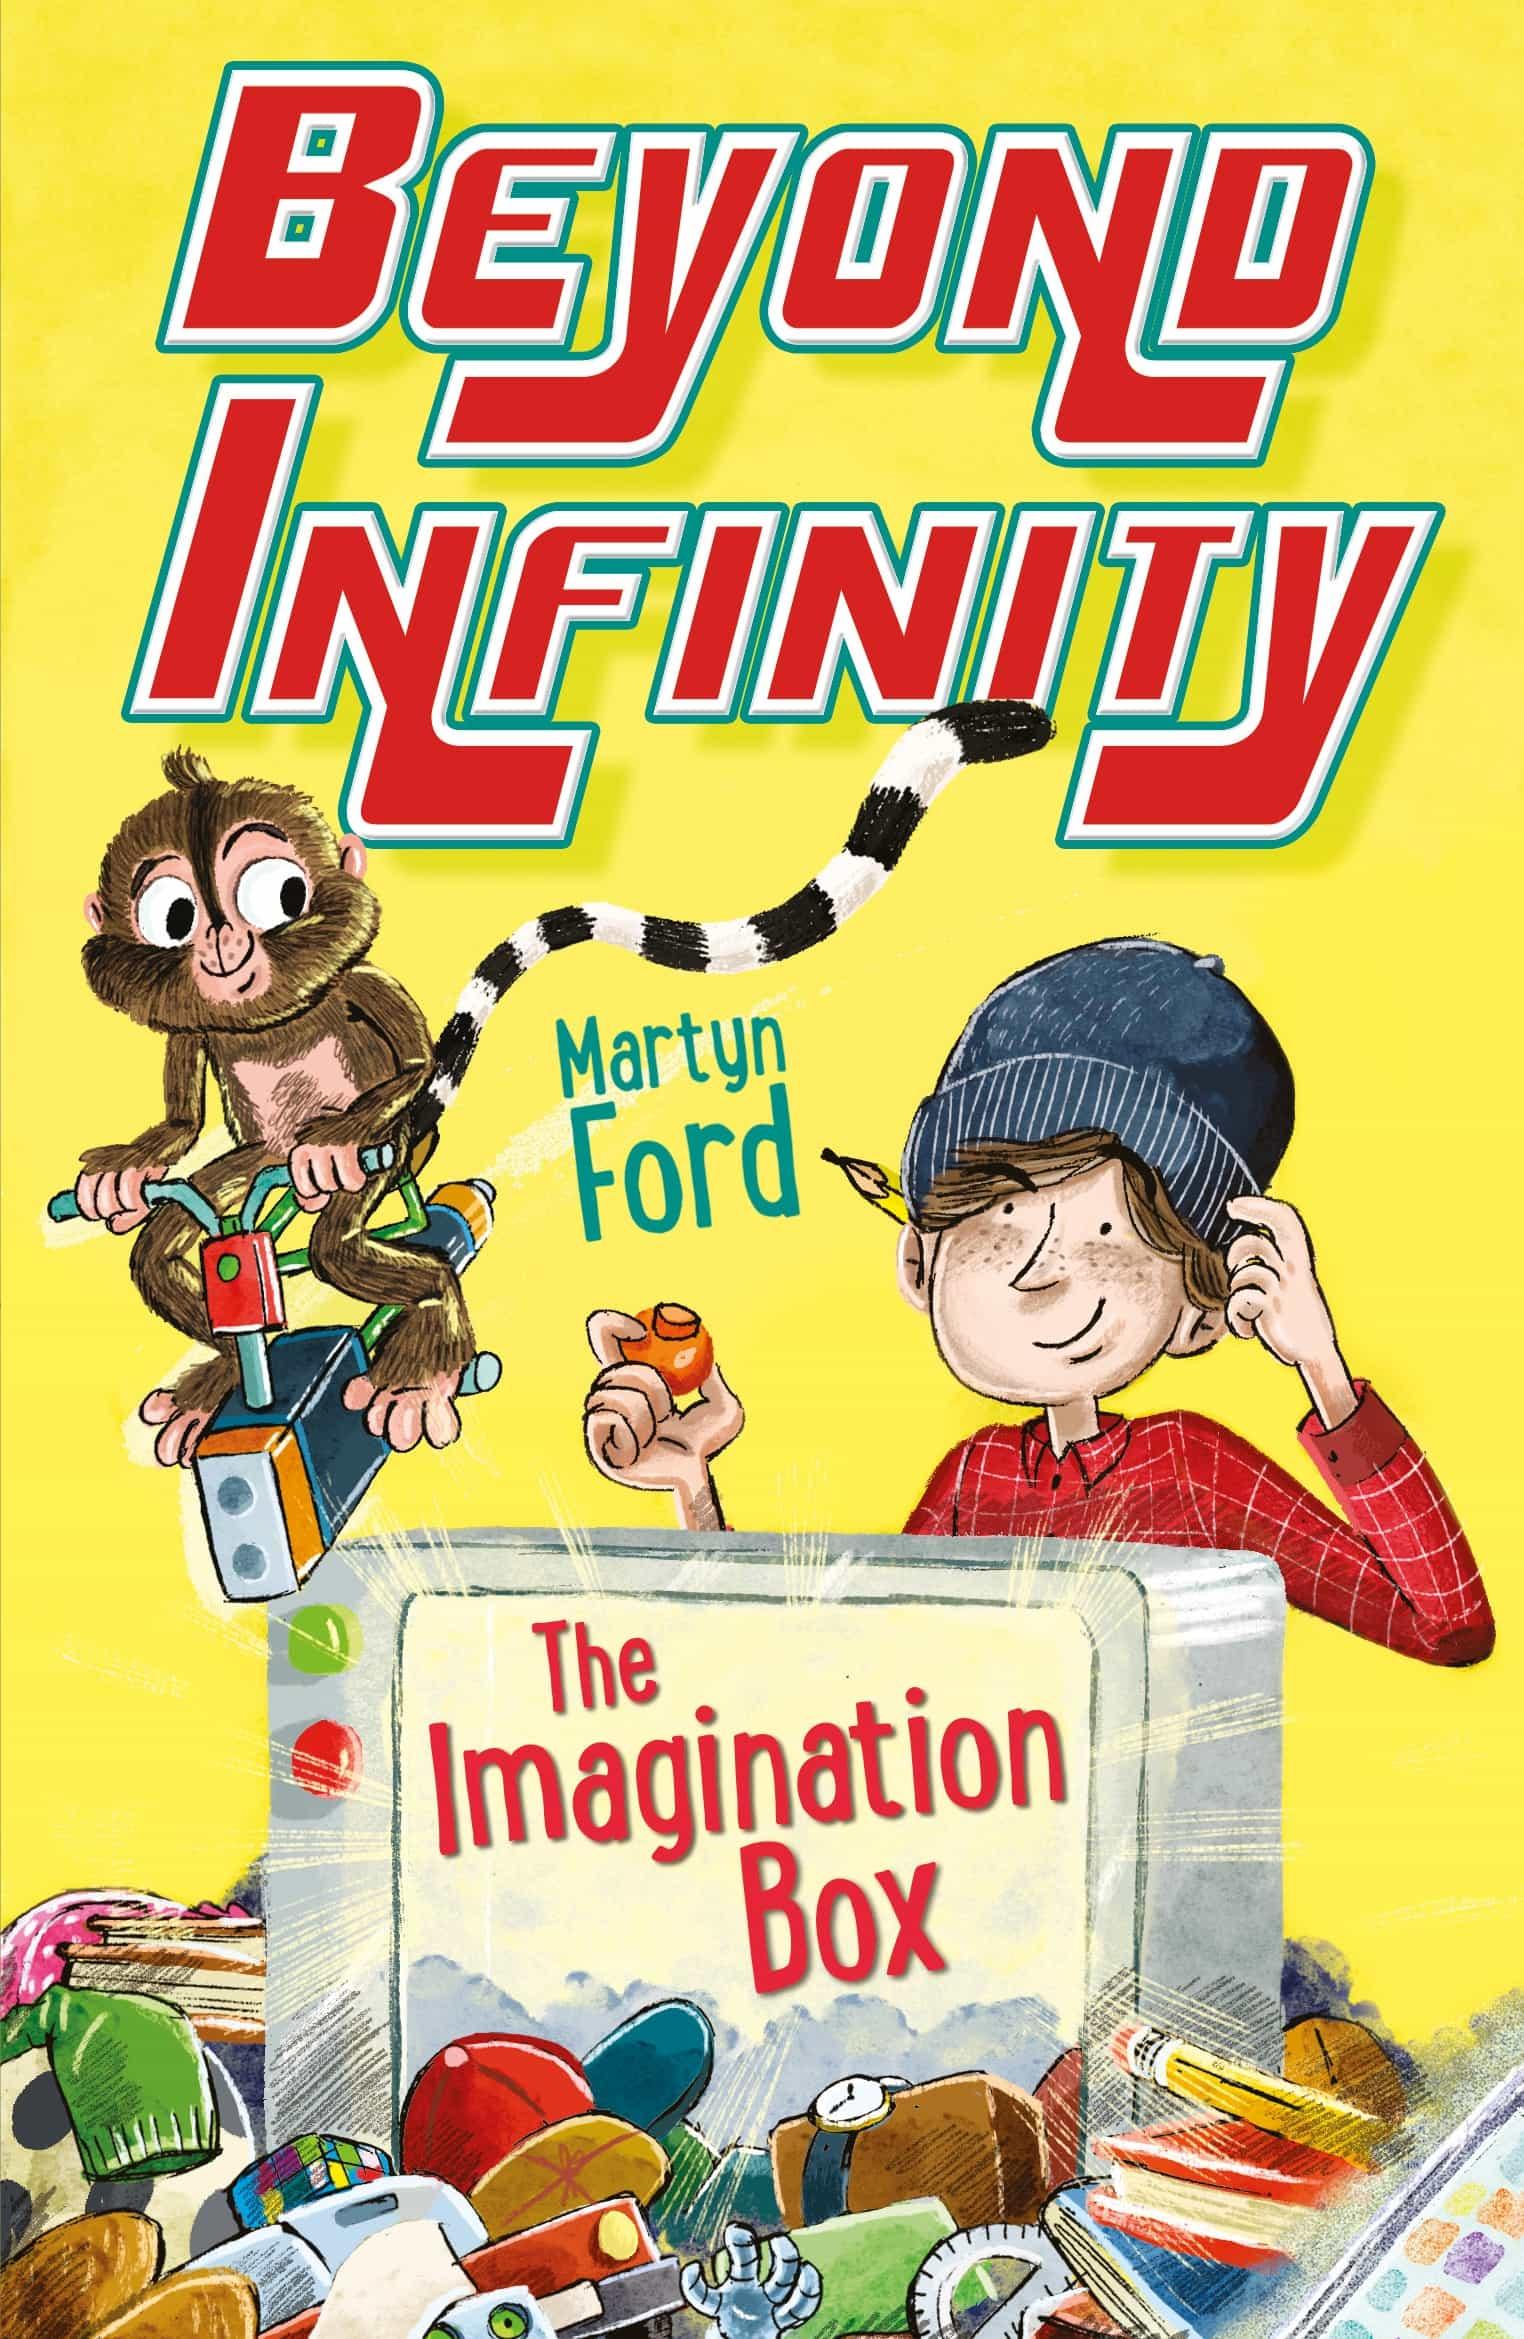 The Imagination Box: Beyond Infinity